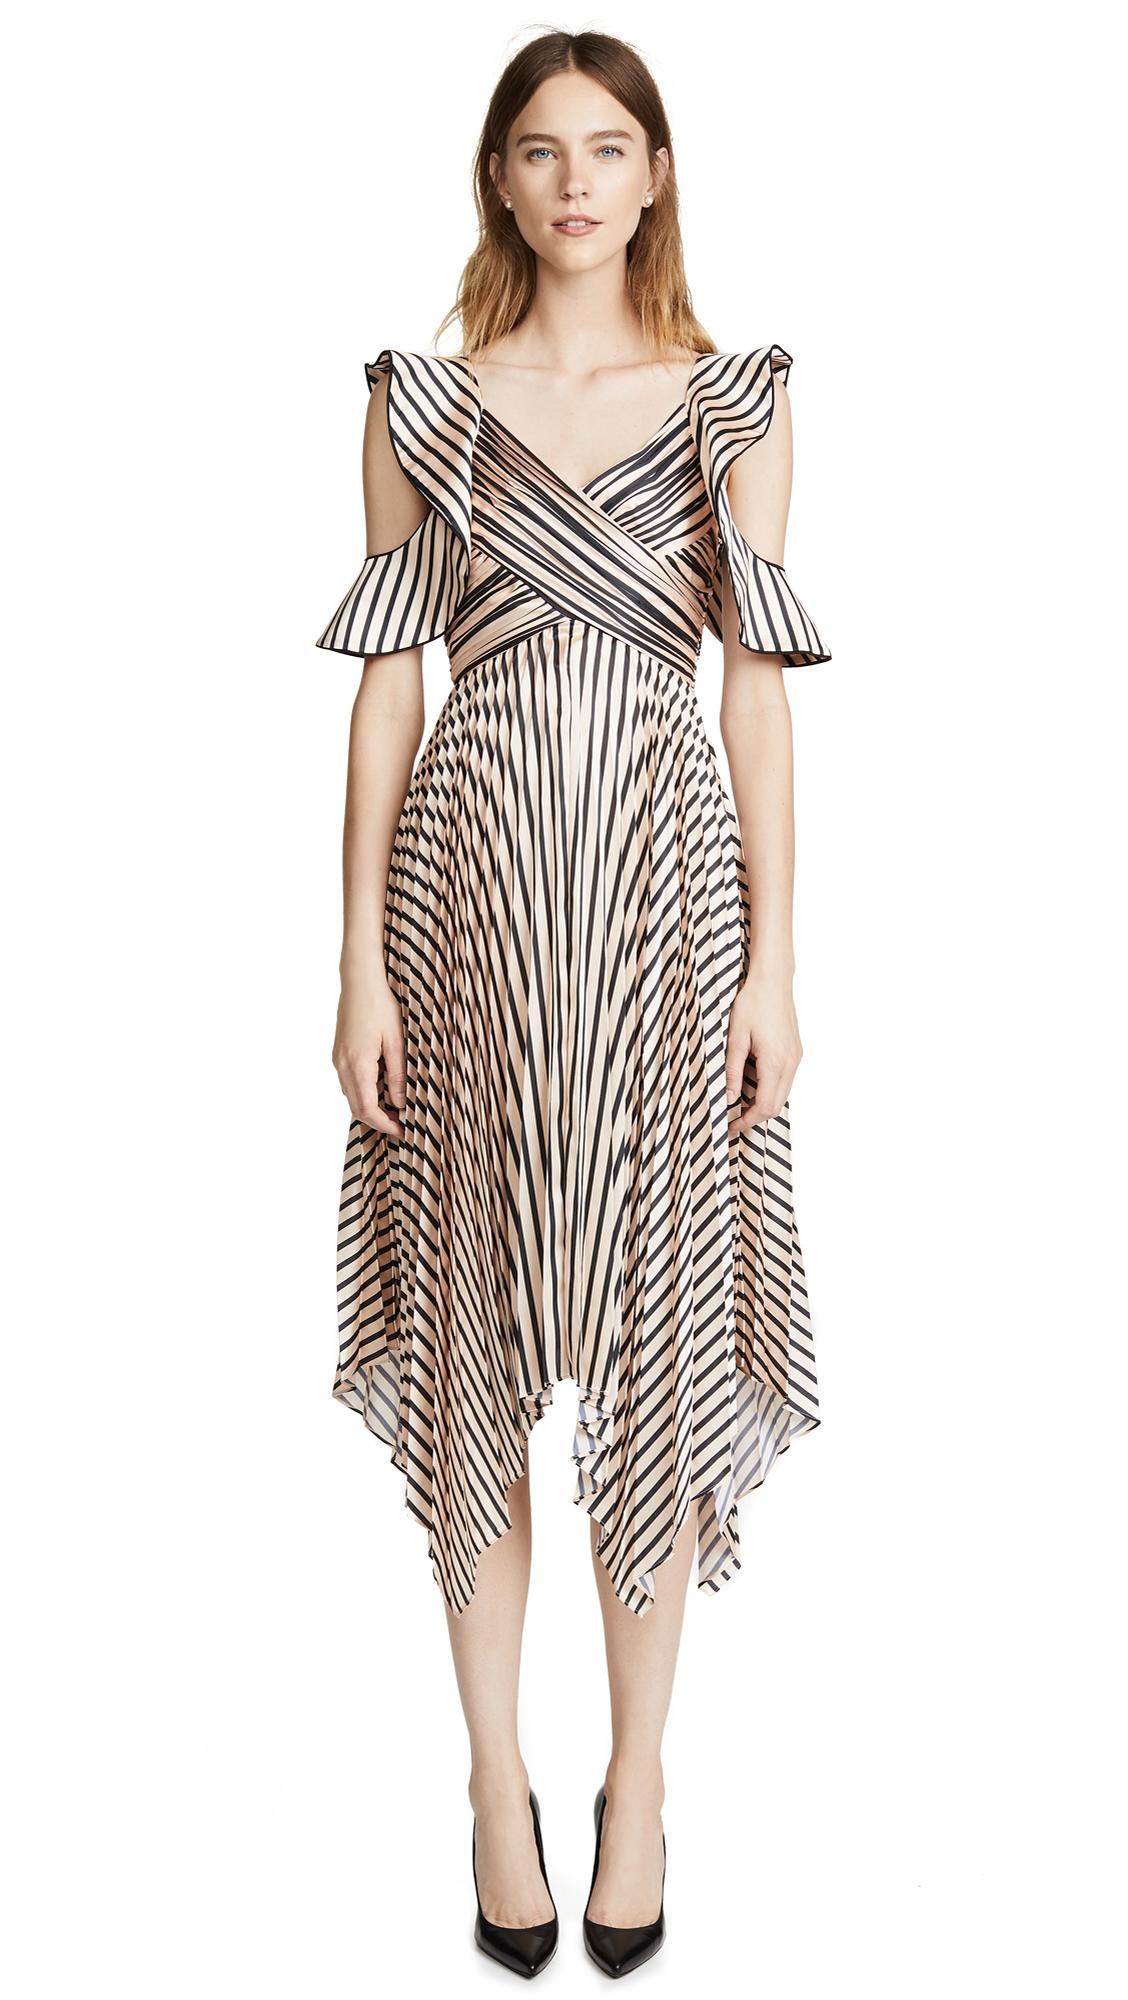 Self Portrait Stripe Midi Dress - Nude/Black